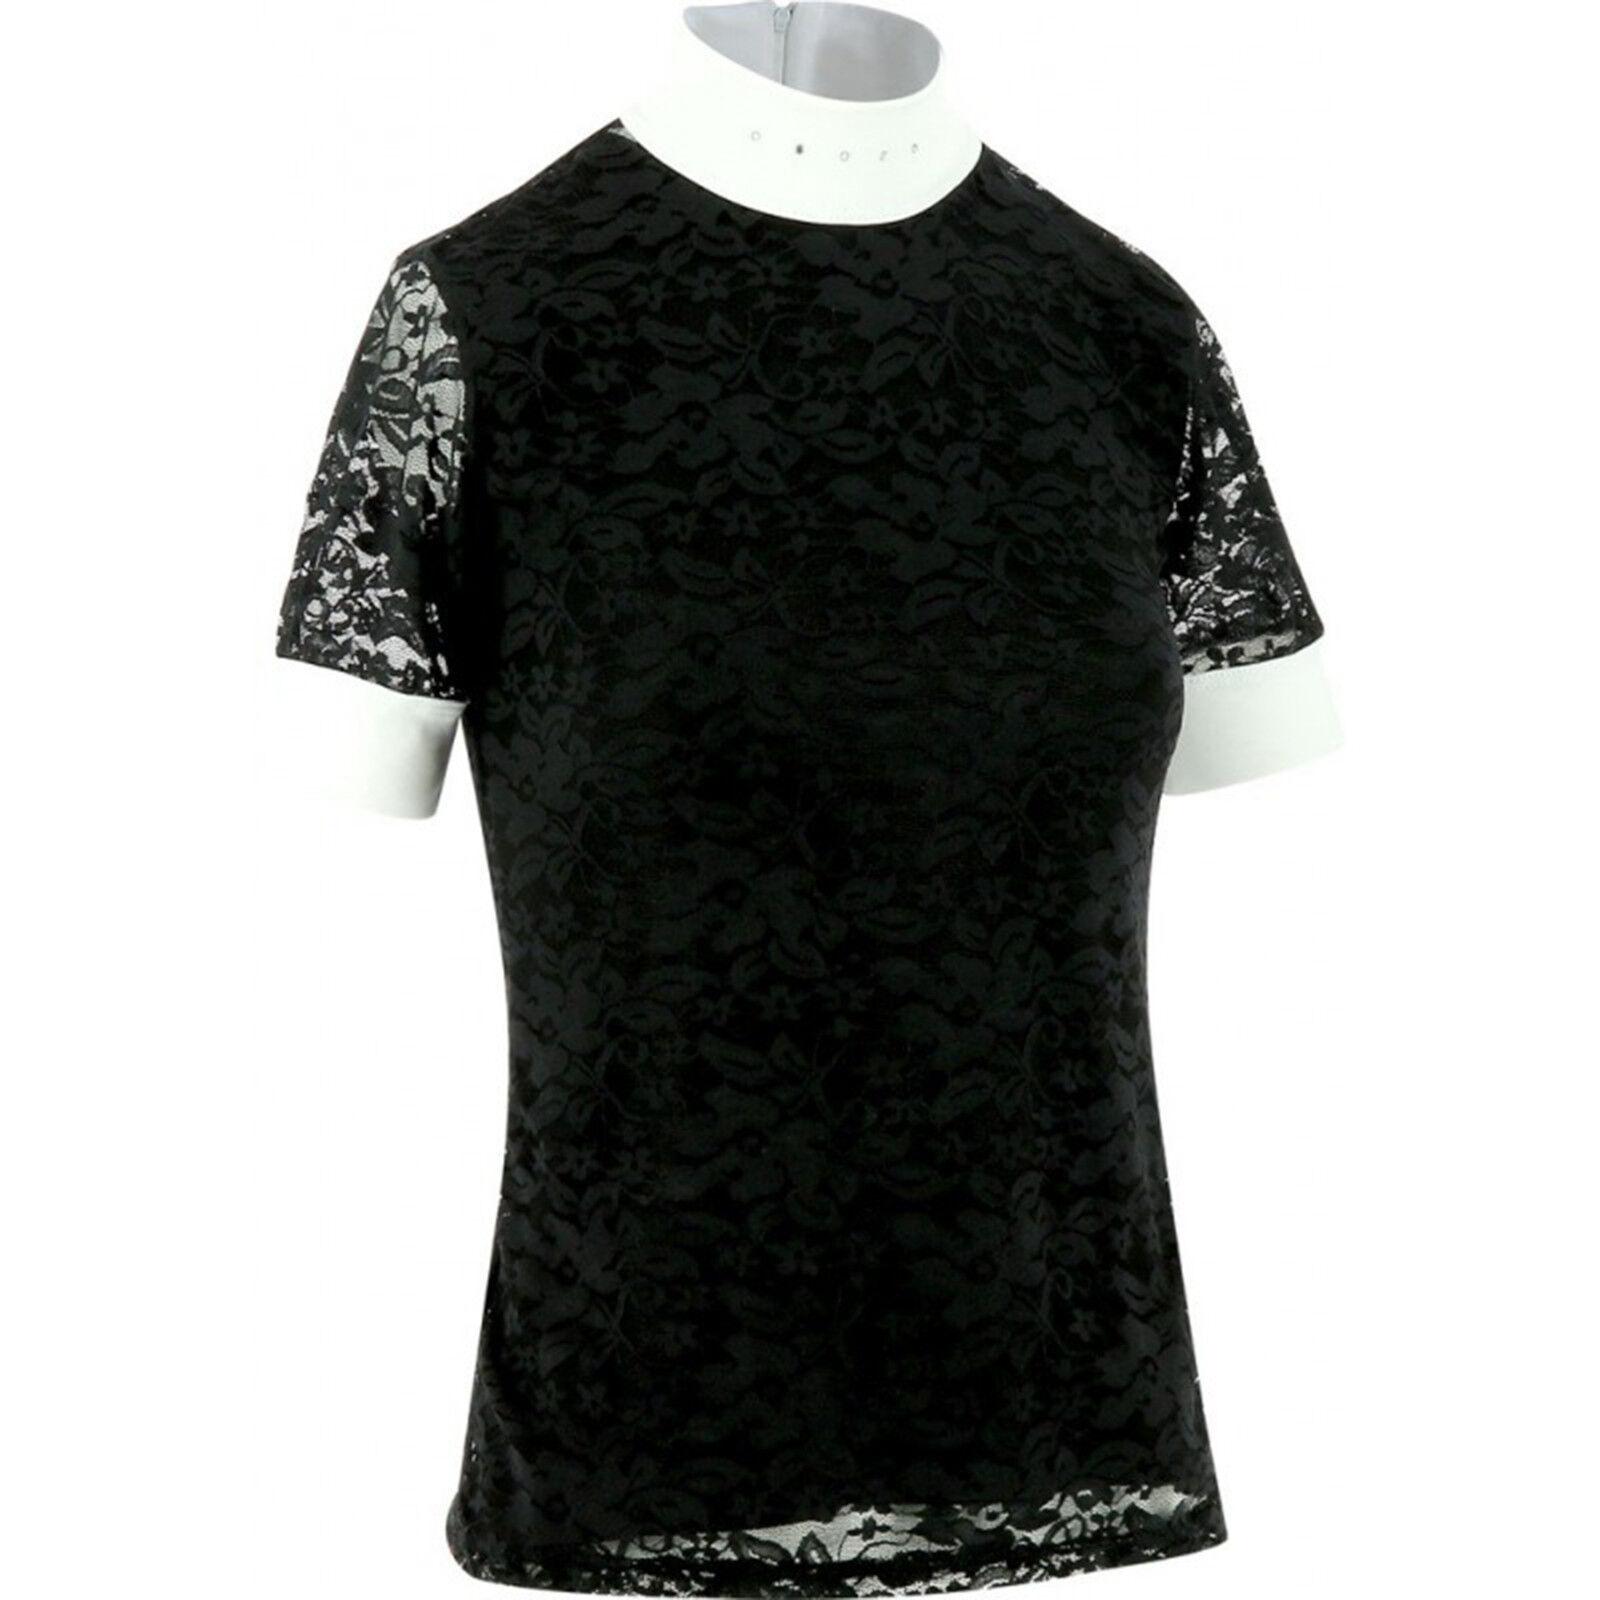 Equi Theme Turniershirt Dentelle 2-teilig edle Spitzen black und white